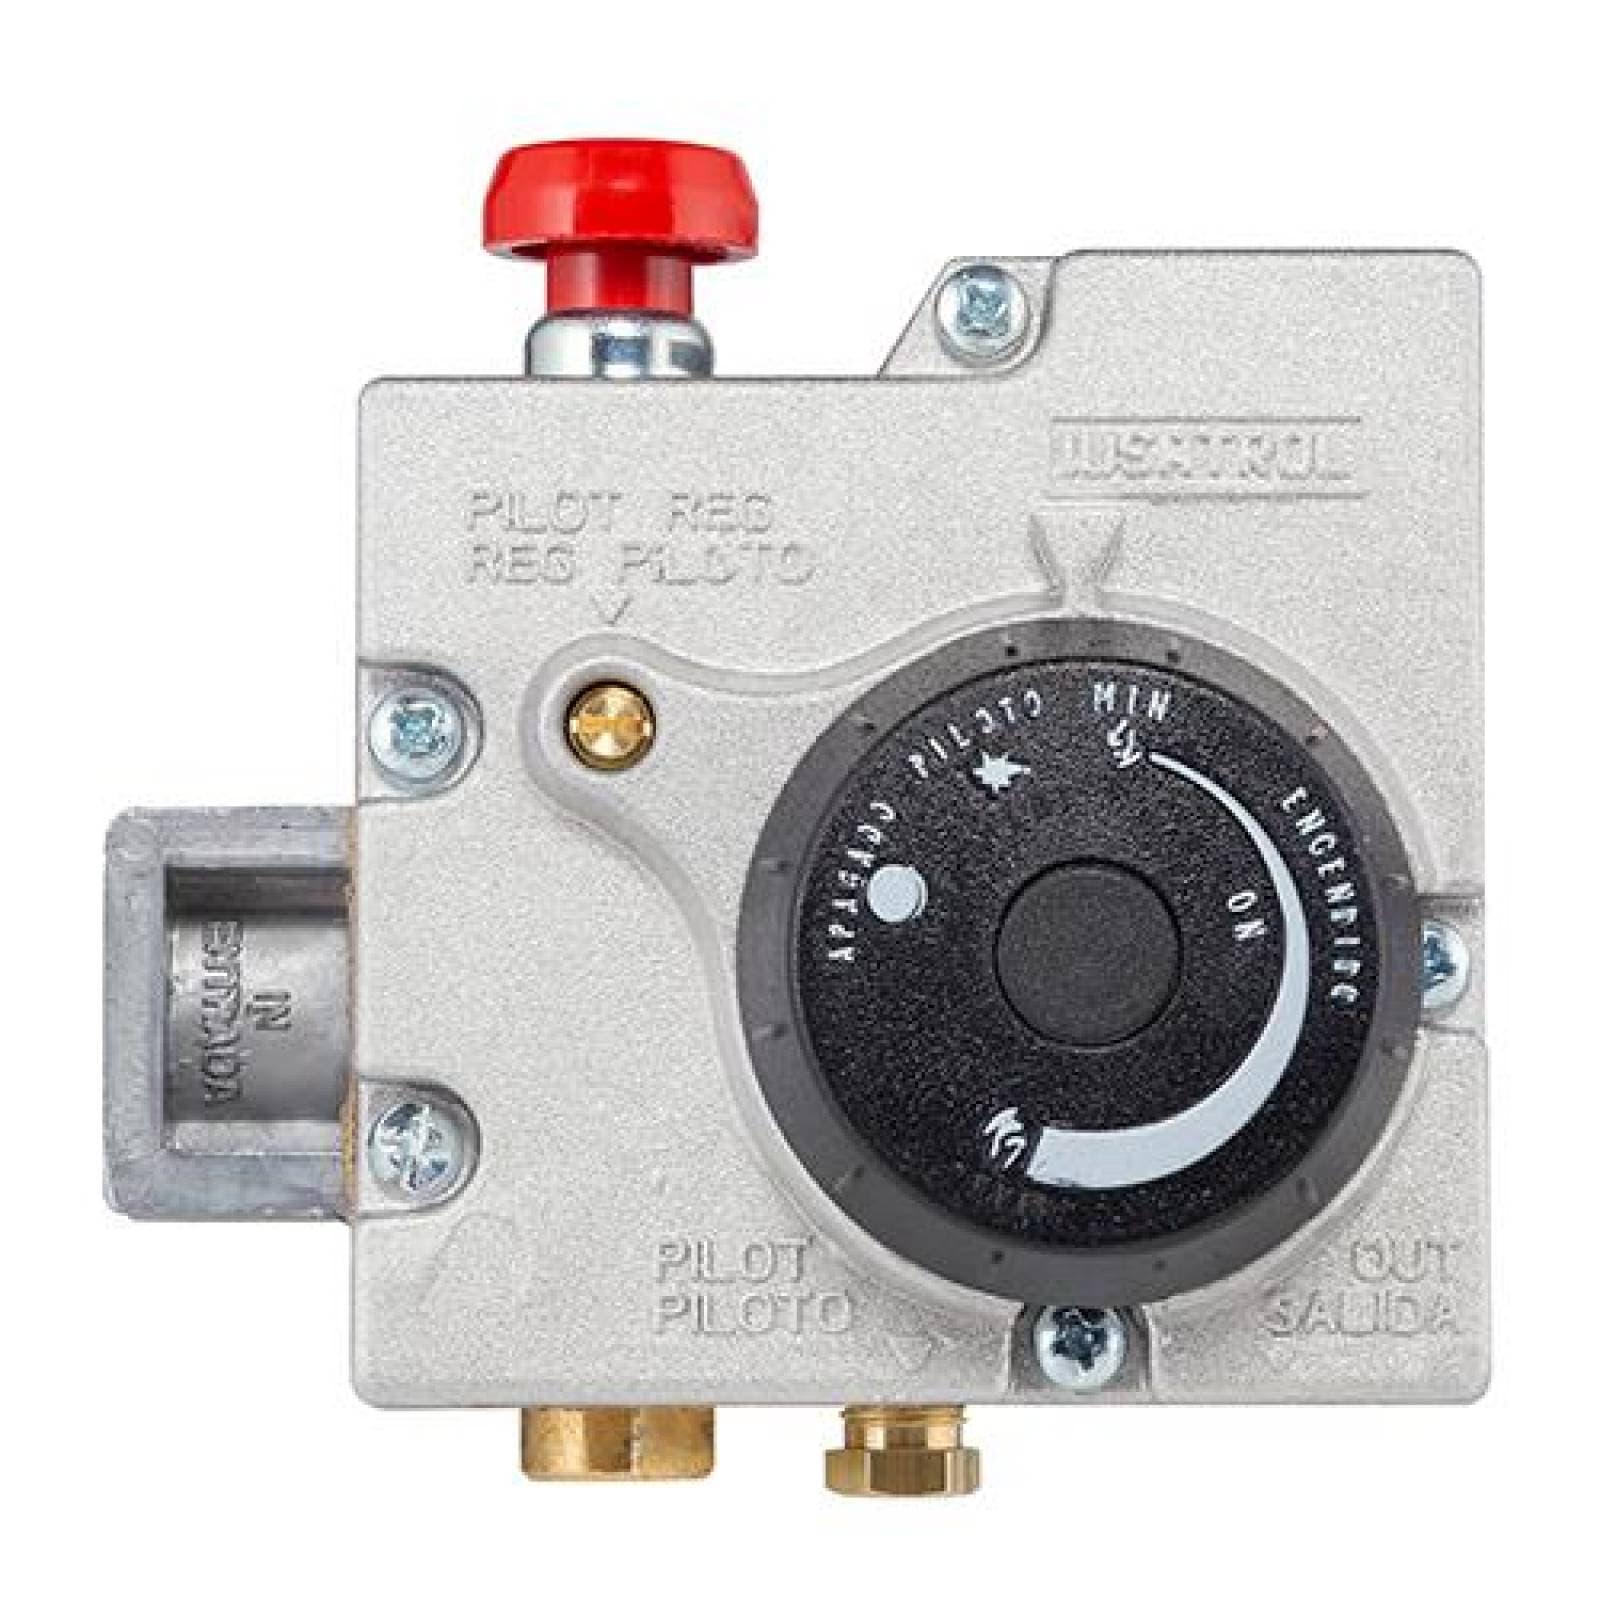 Termostato p boiler IUSA modelos 2013 y anteriores